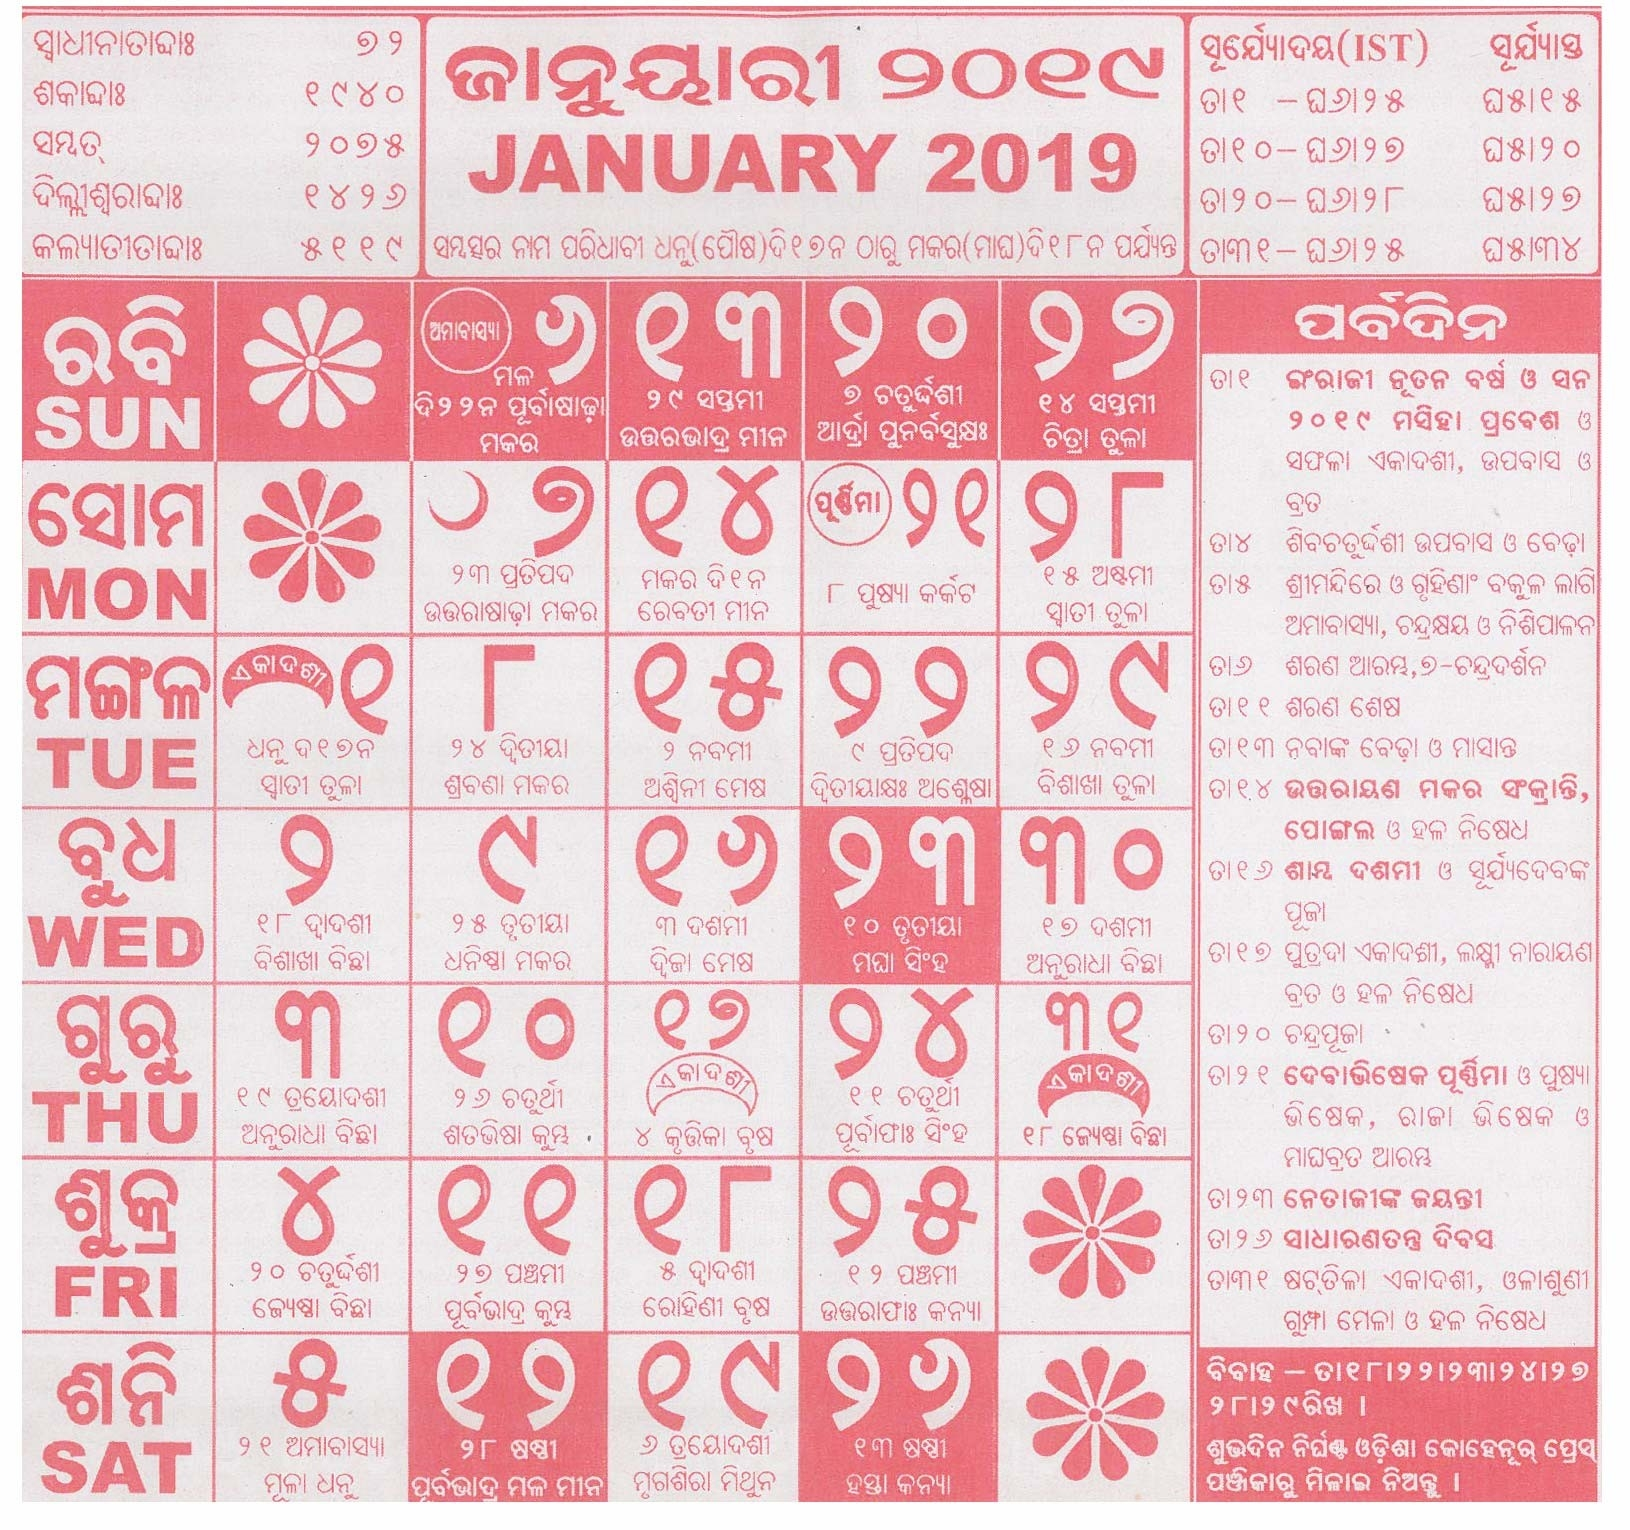 Odia Calender, Odia Panji, Odia Calendar, Kohinoor Odia-Odia Calendar 2020 January